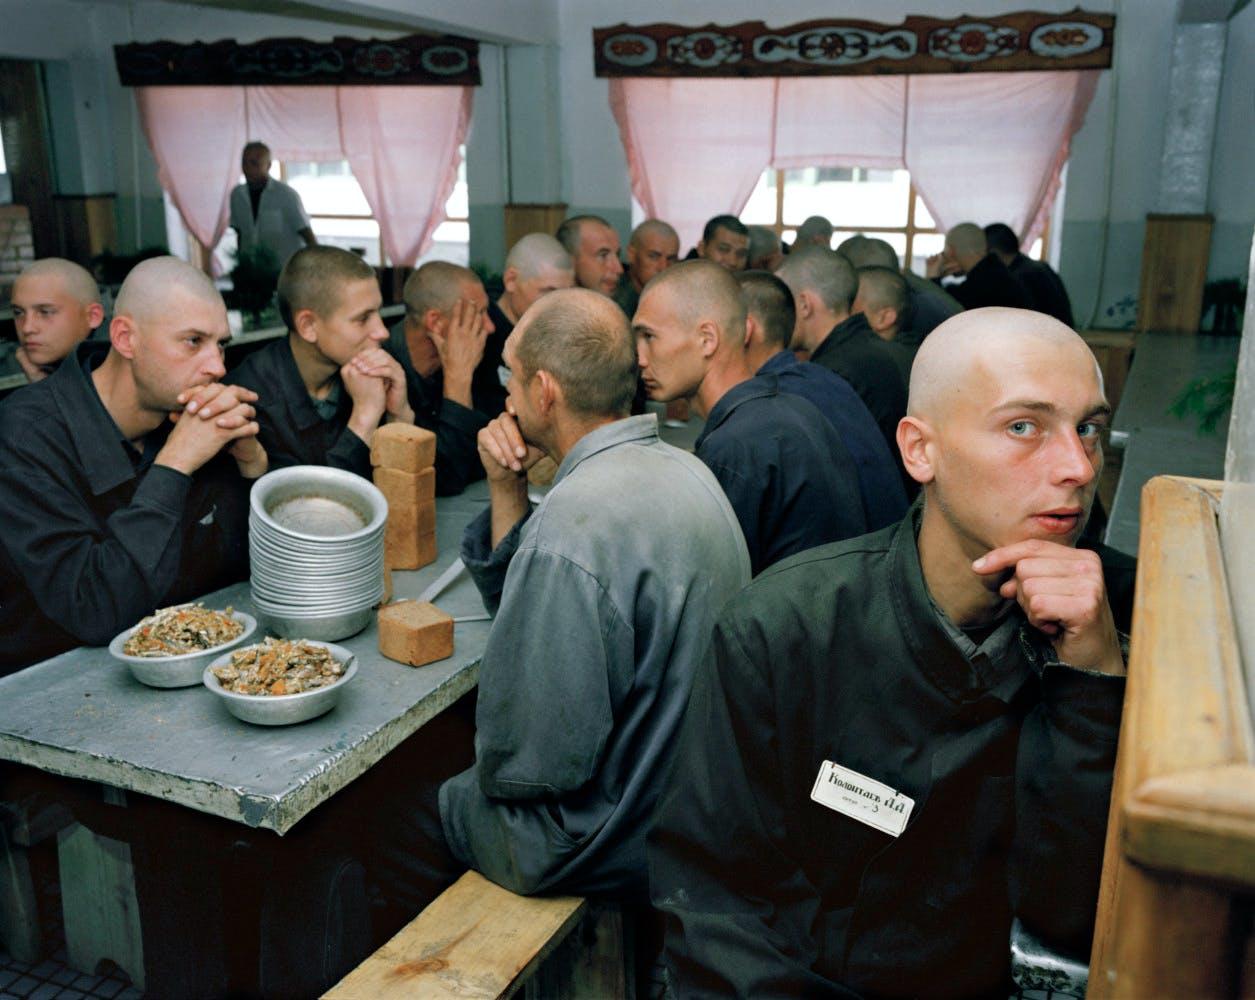 CARL DE KEYZER: PRISON PROPAGANDA